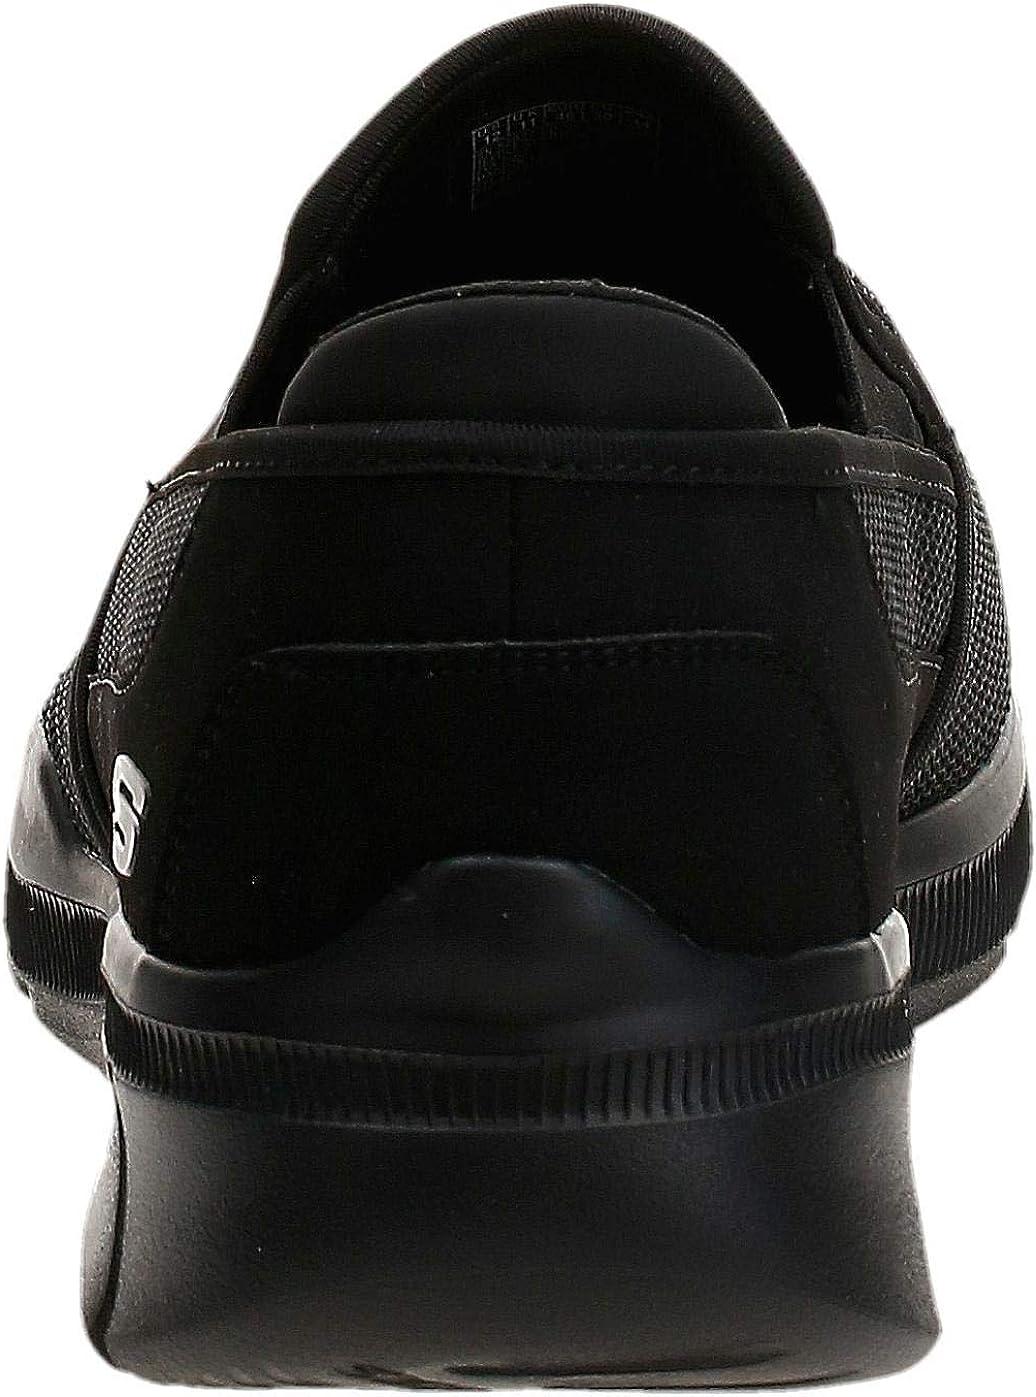 Skechers Men's Equalizer 3.0- Sumnin Slip On Sneakers Black Black Bbk